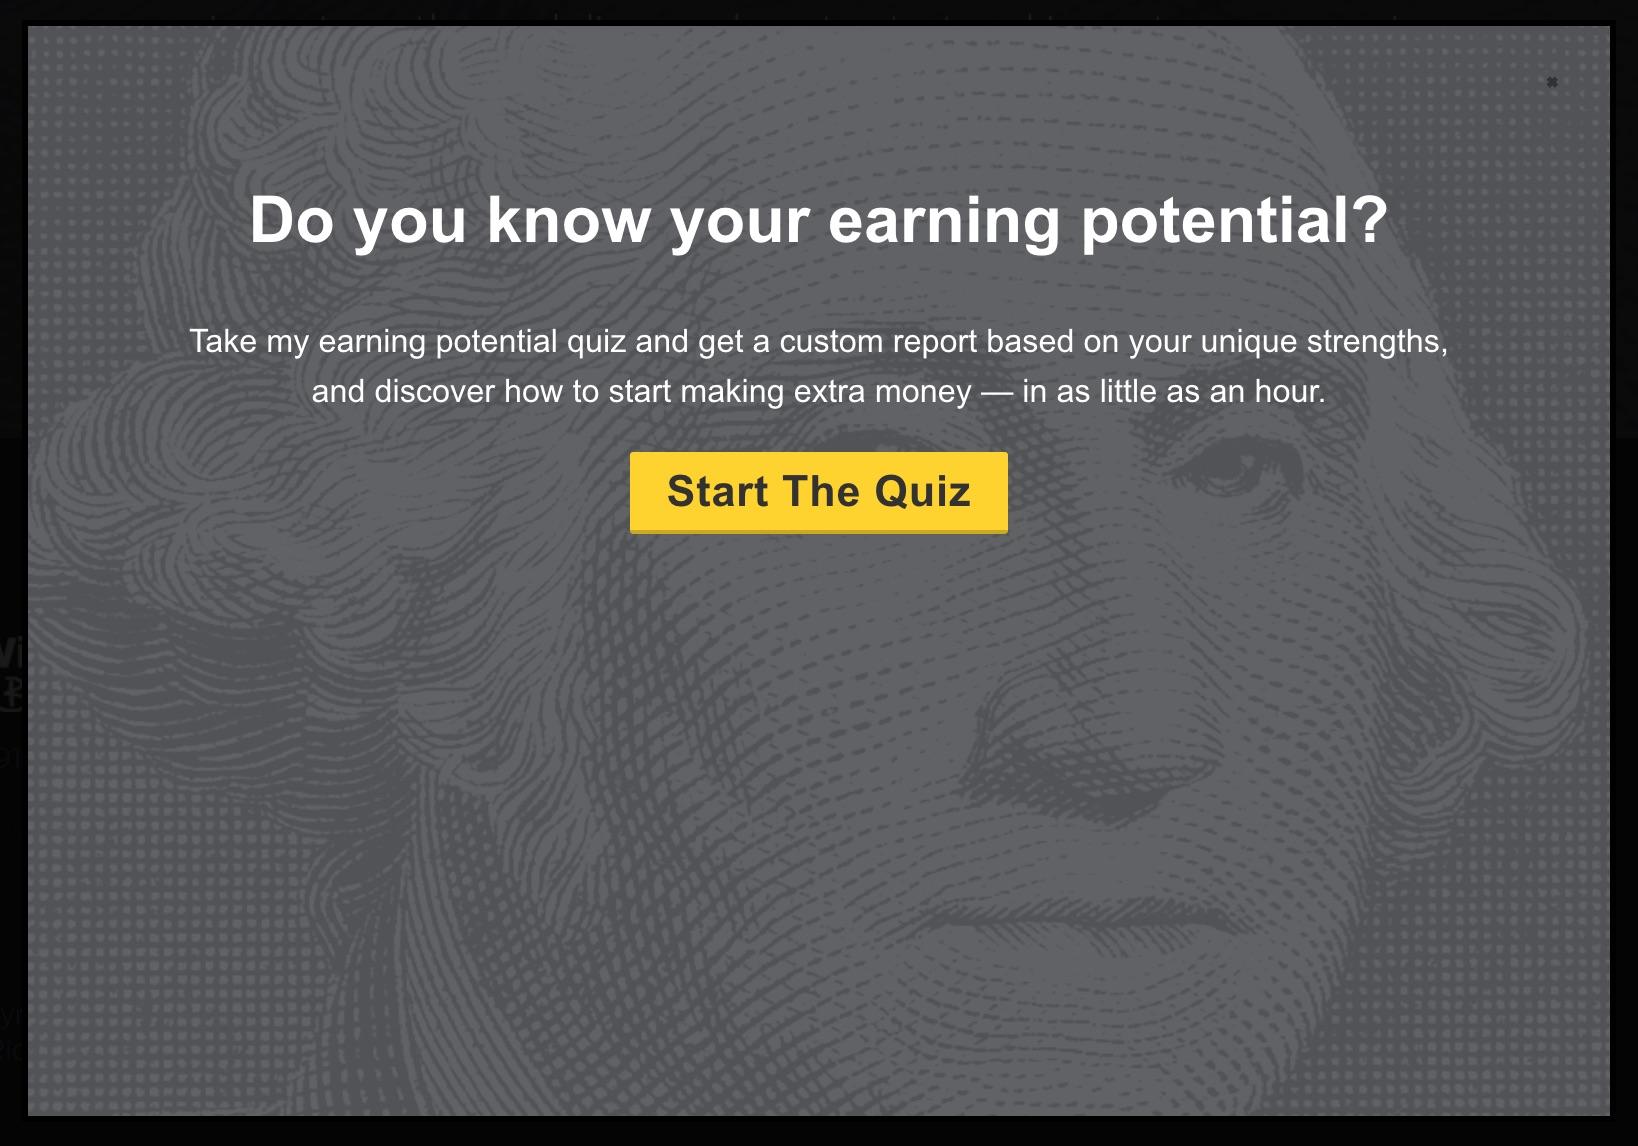 Quiz pop up